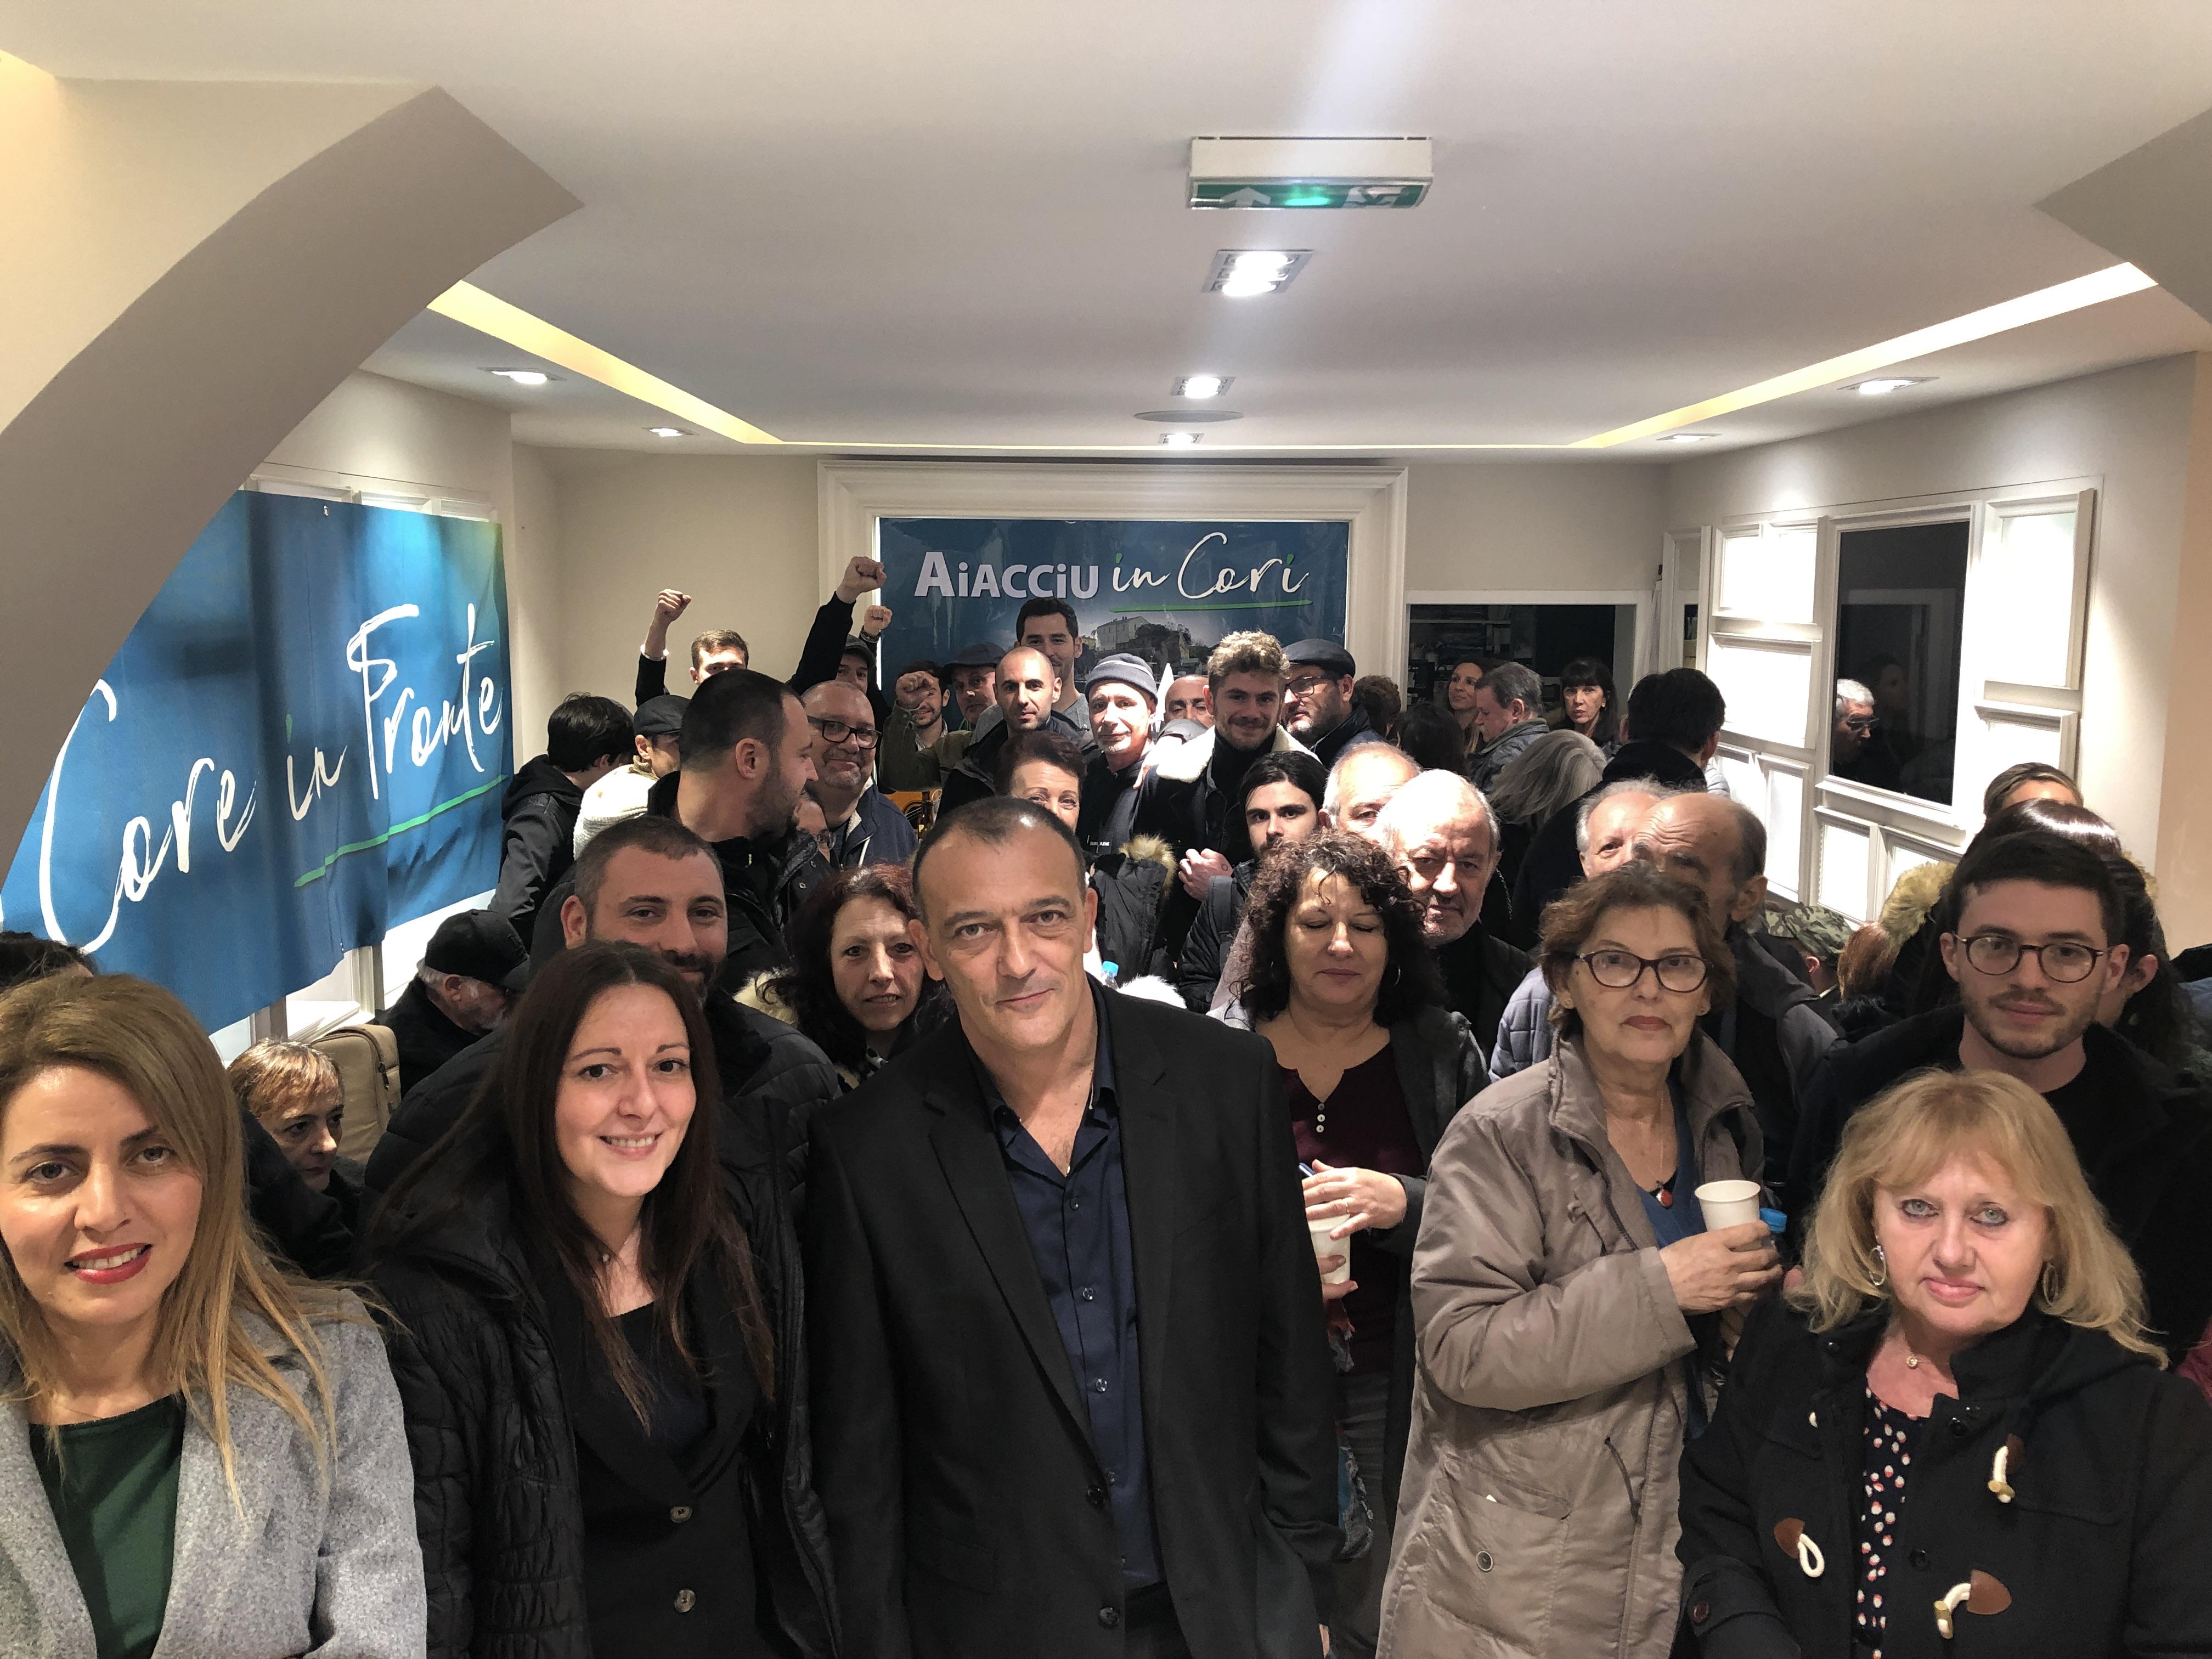 VIDEO - Municipales : Aiacciu in Cori a ouvert sa permanence